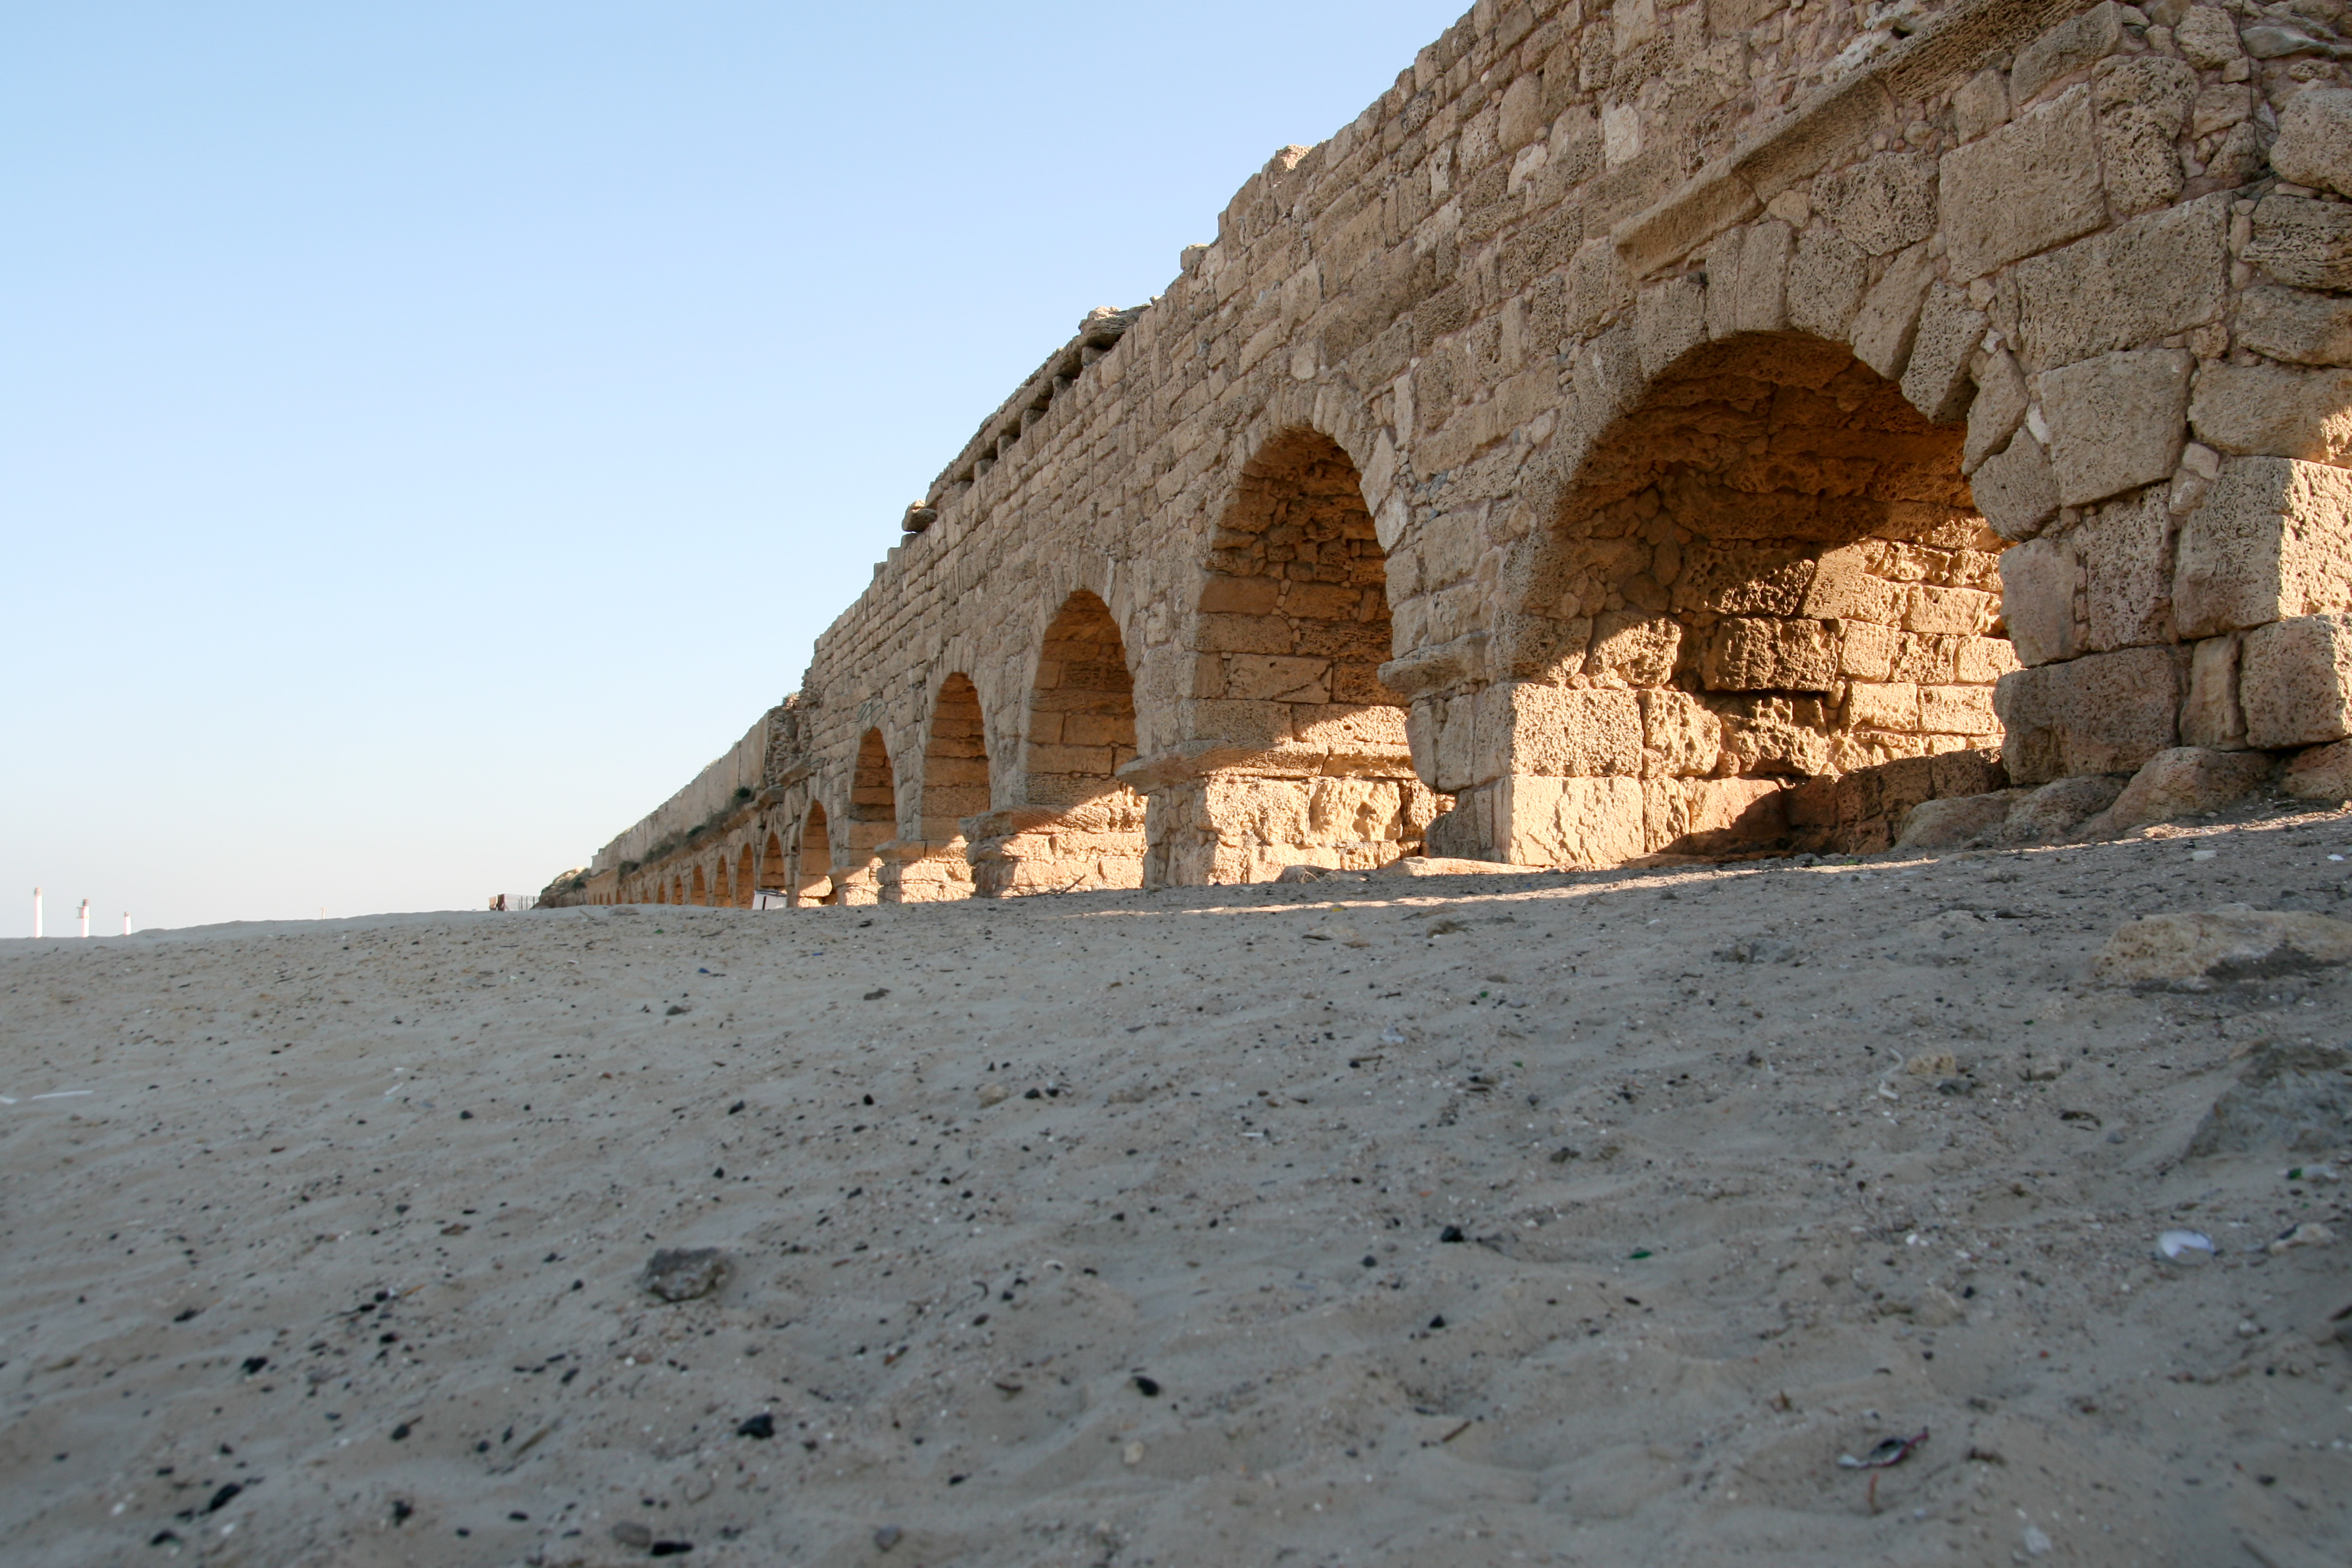 Roman aqueduct in Caesarea Maritima (source: Wikimedia Commons)